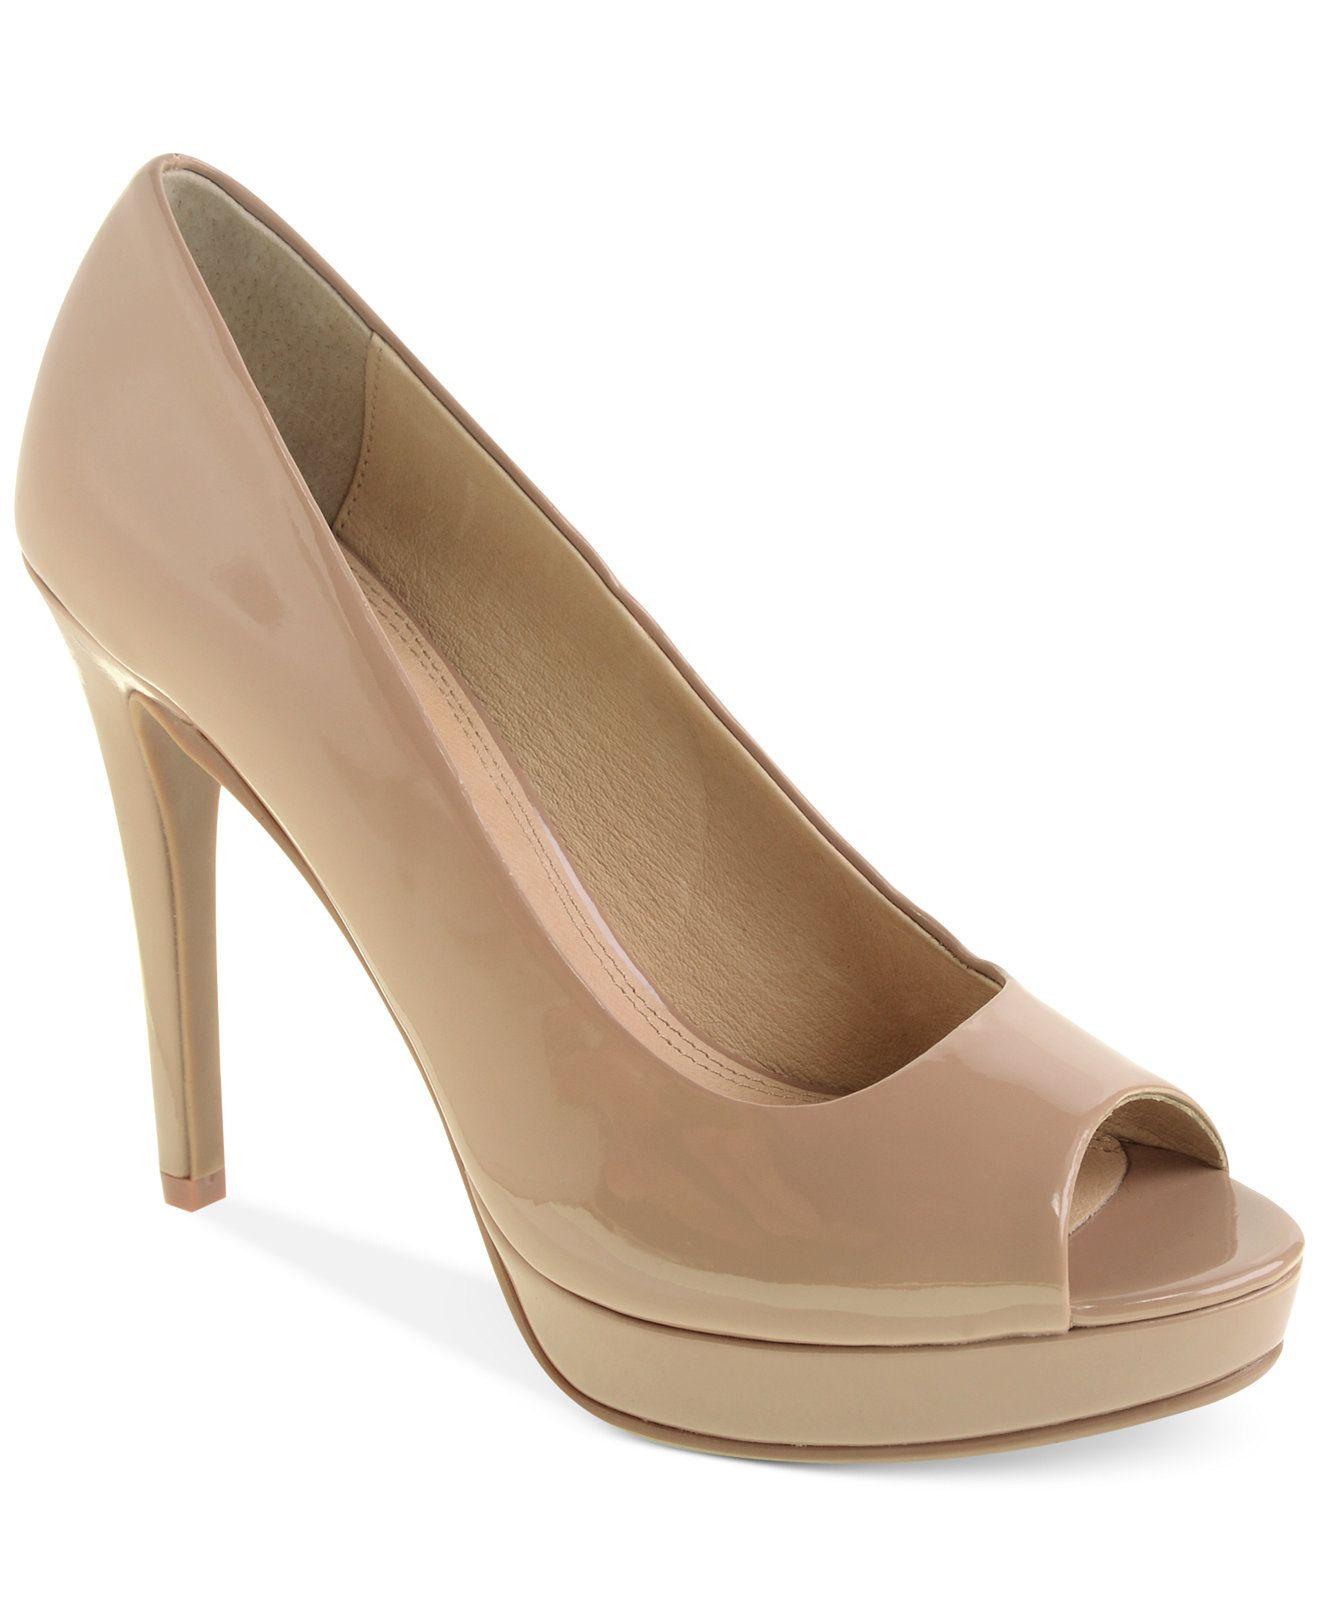 Platform pumps heels